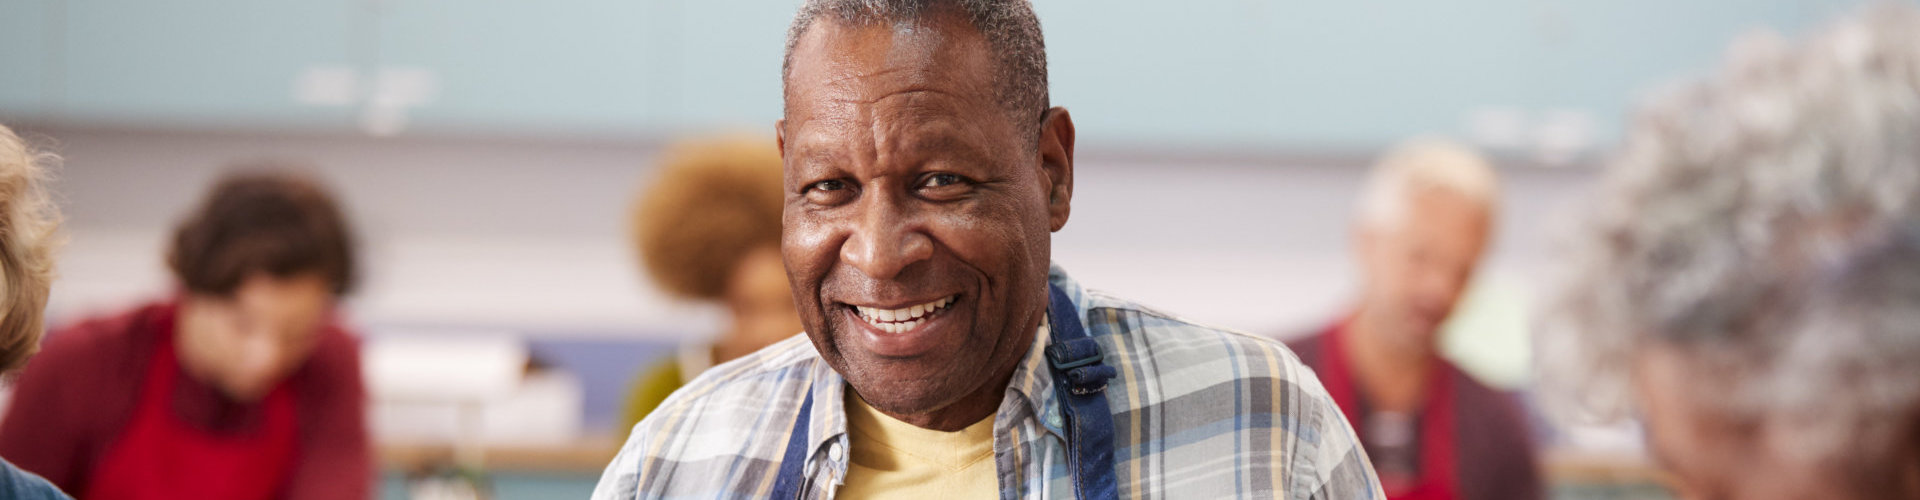 an elderly smiling